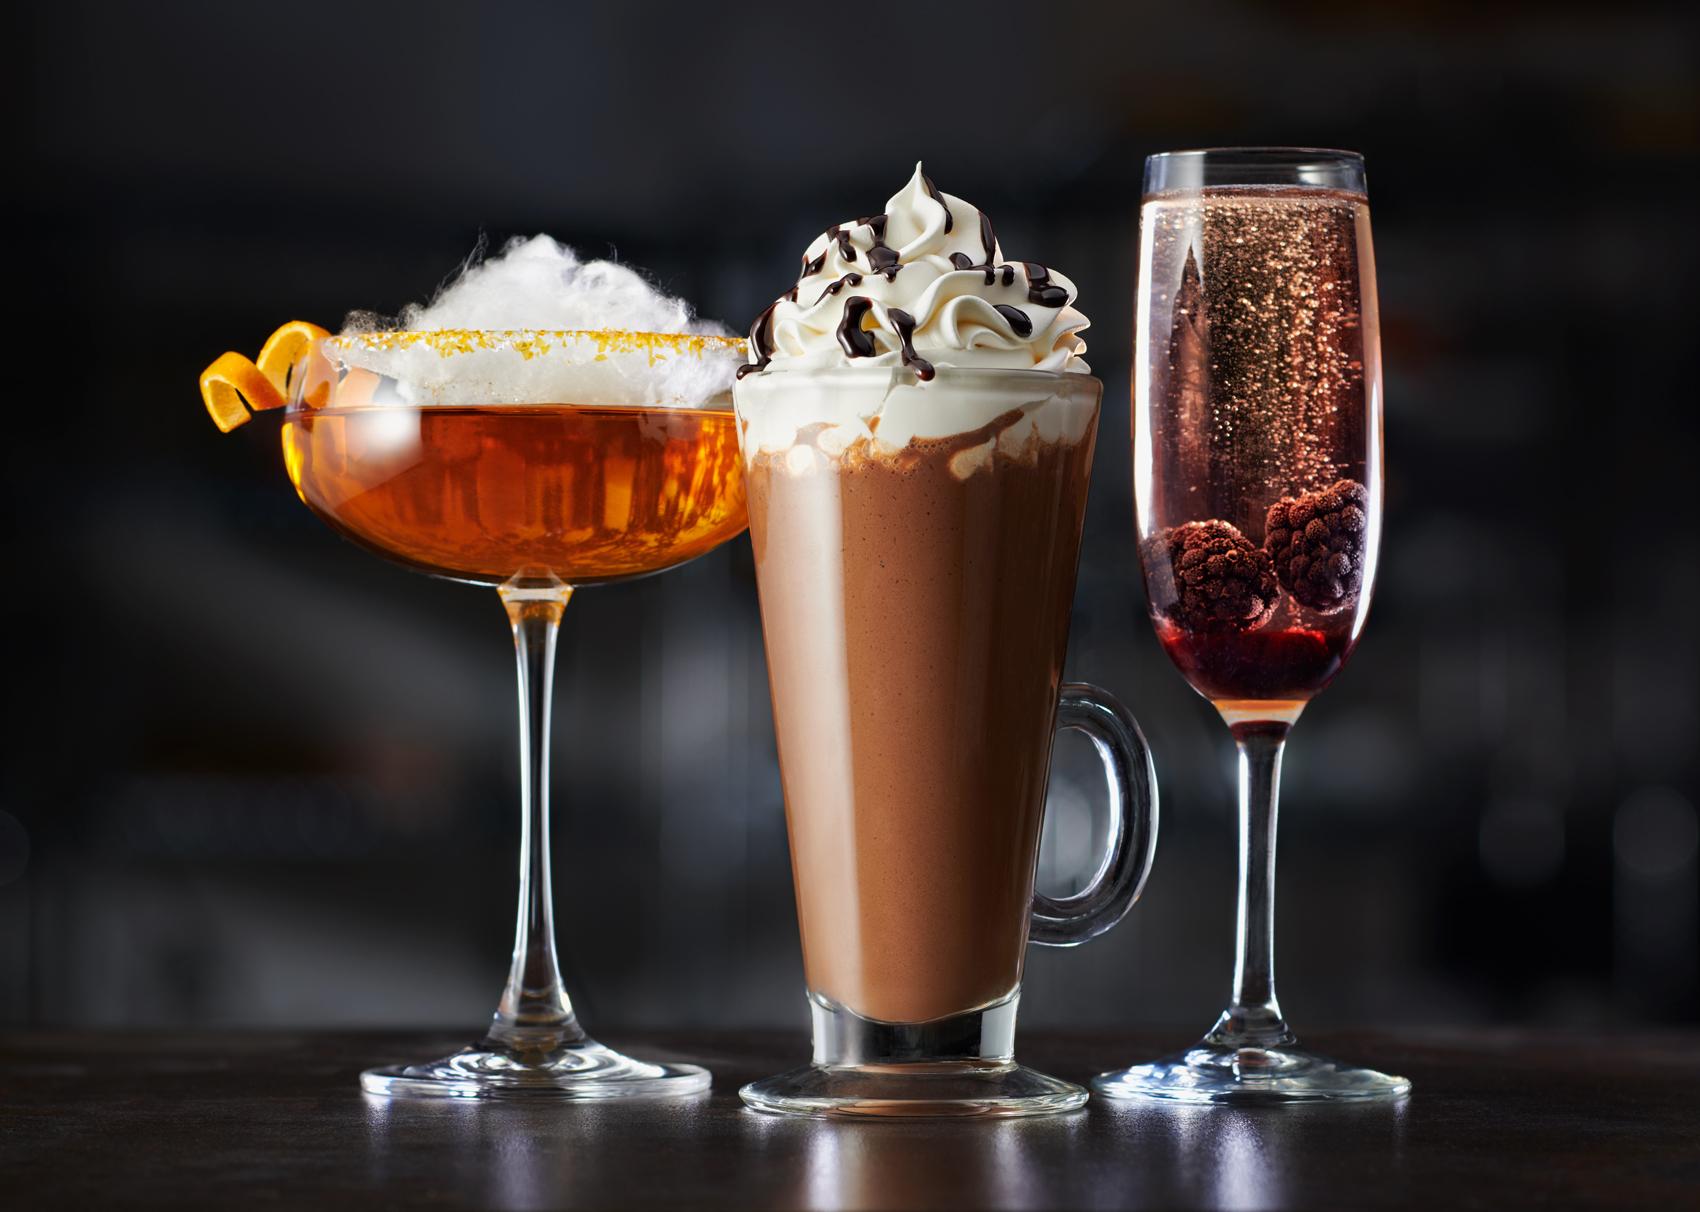 cocktail_shake_champaigne_drinks.jpg